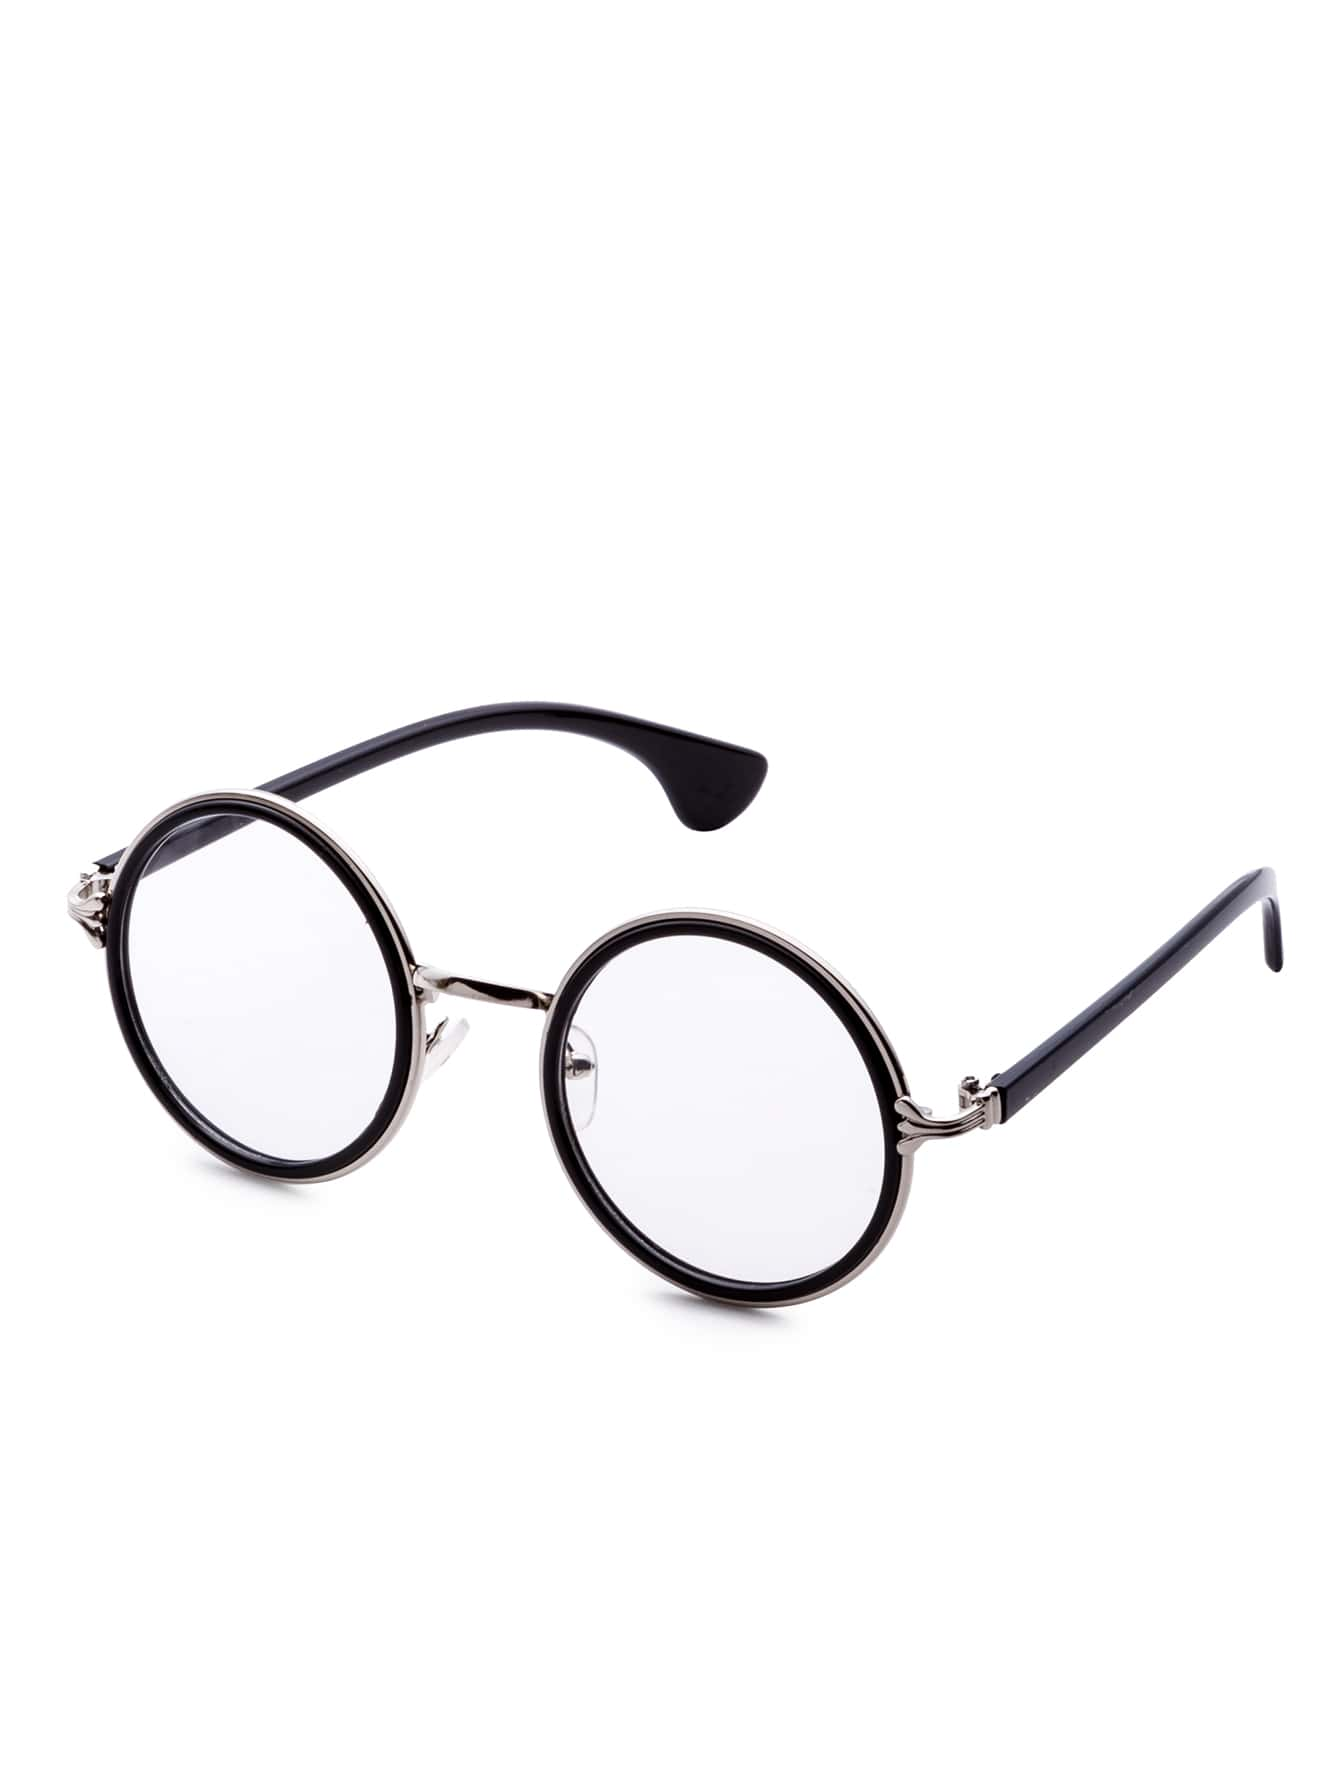 Black Frame Clear Lens Retro Style Round Sunglasses